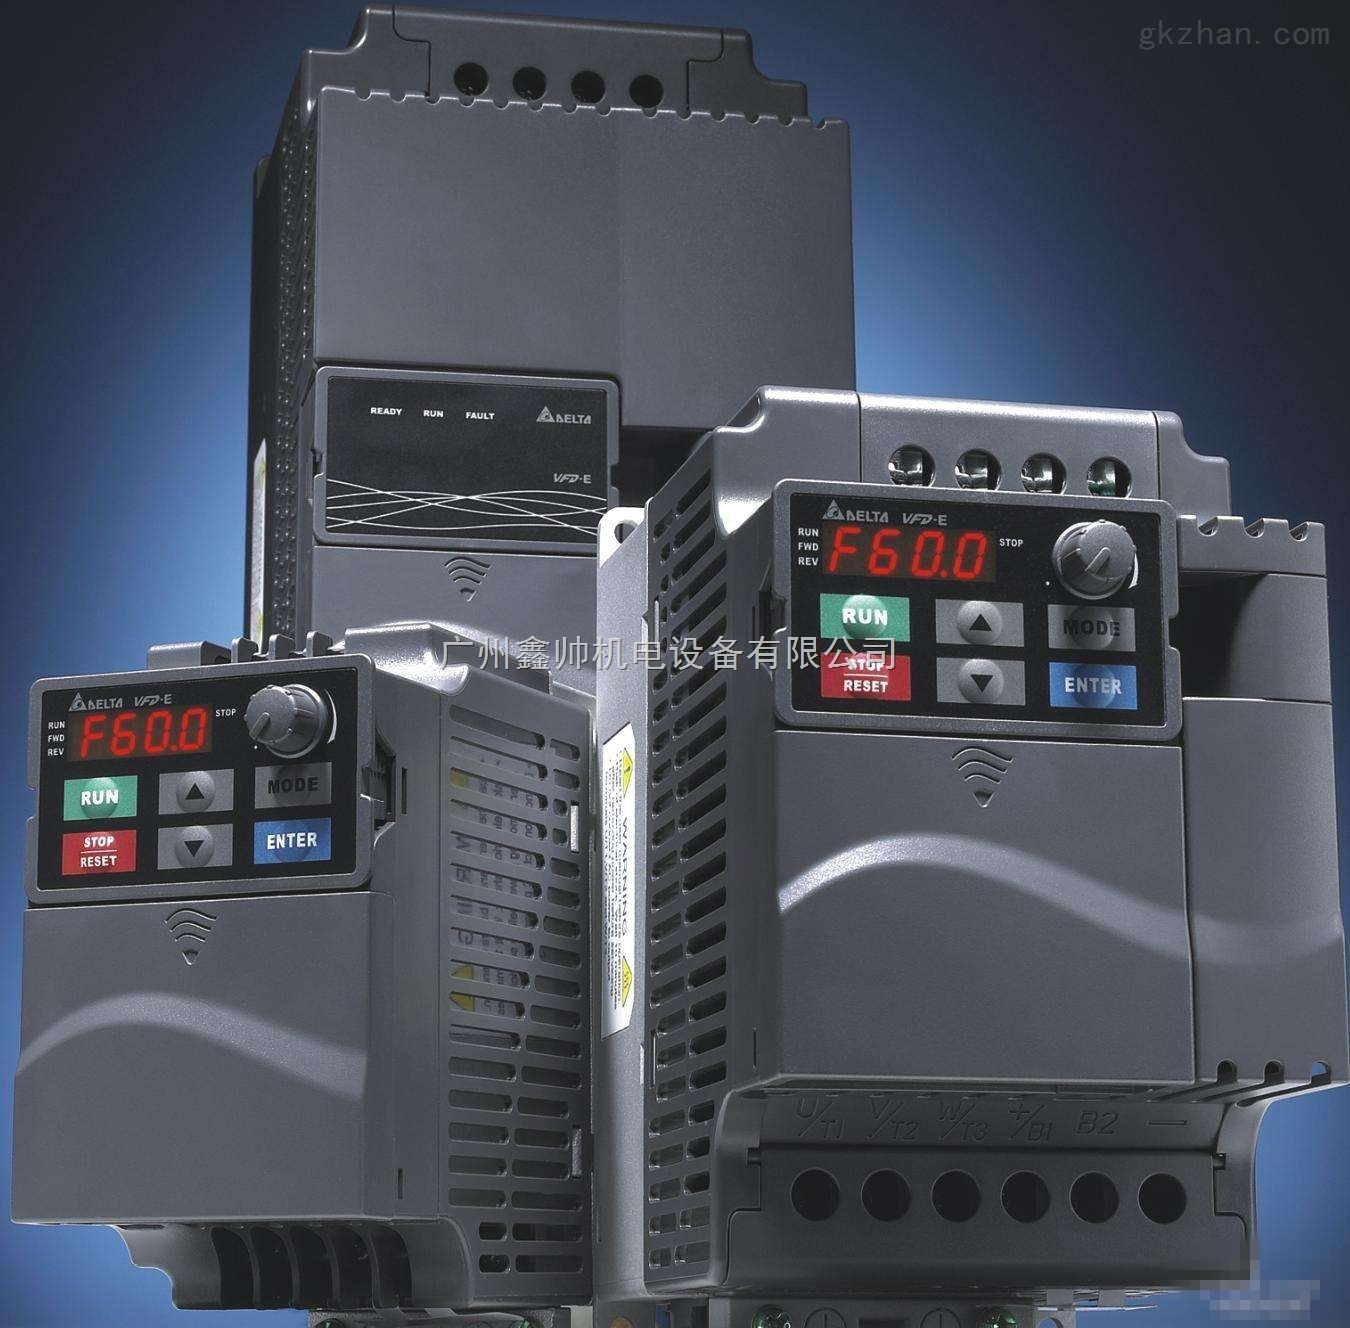 vfd002e11t 台达vfd-e变频器vfd002e11t